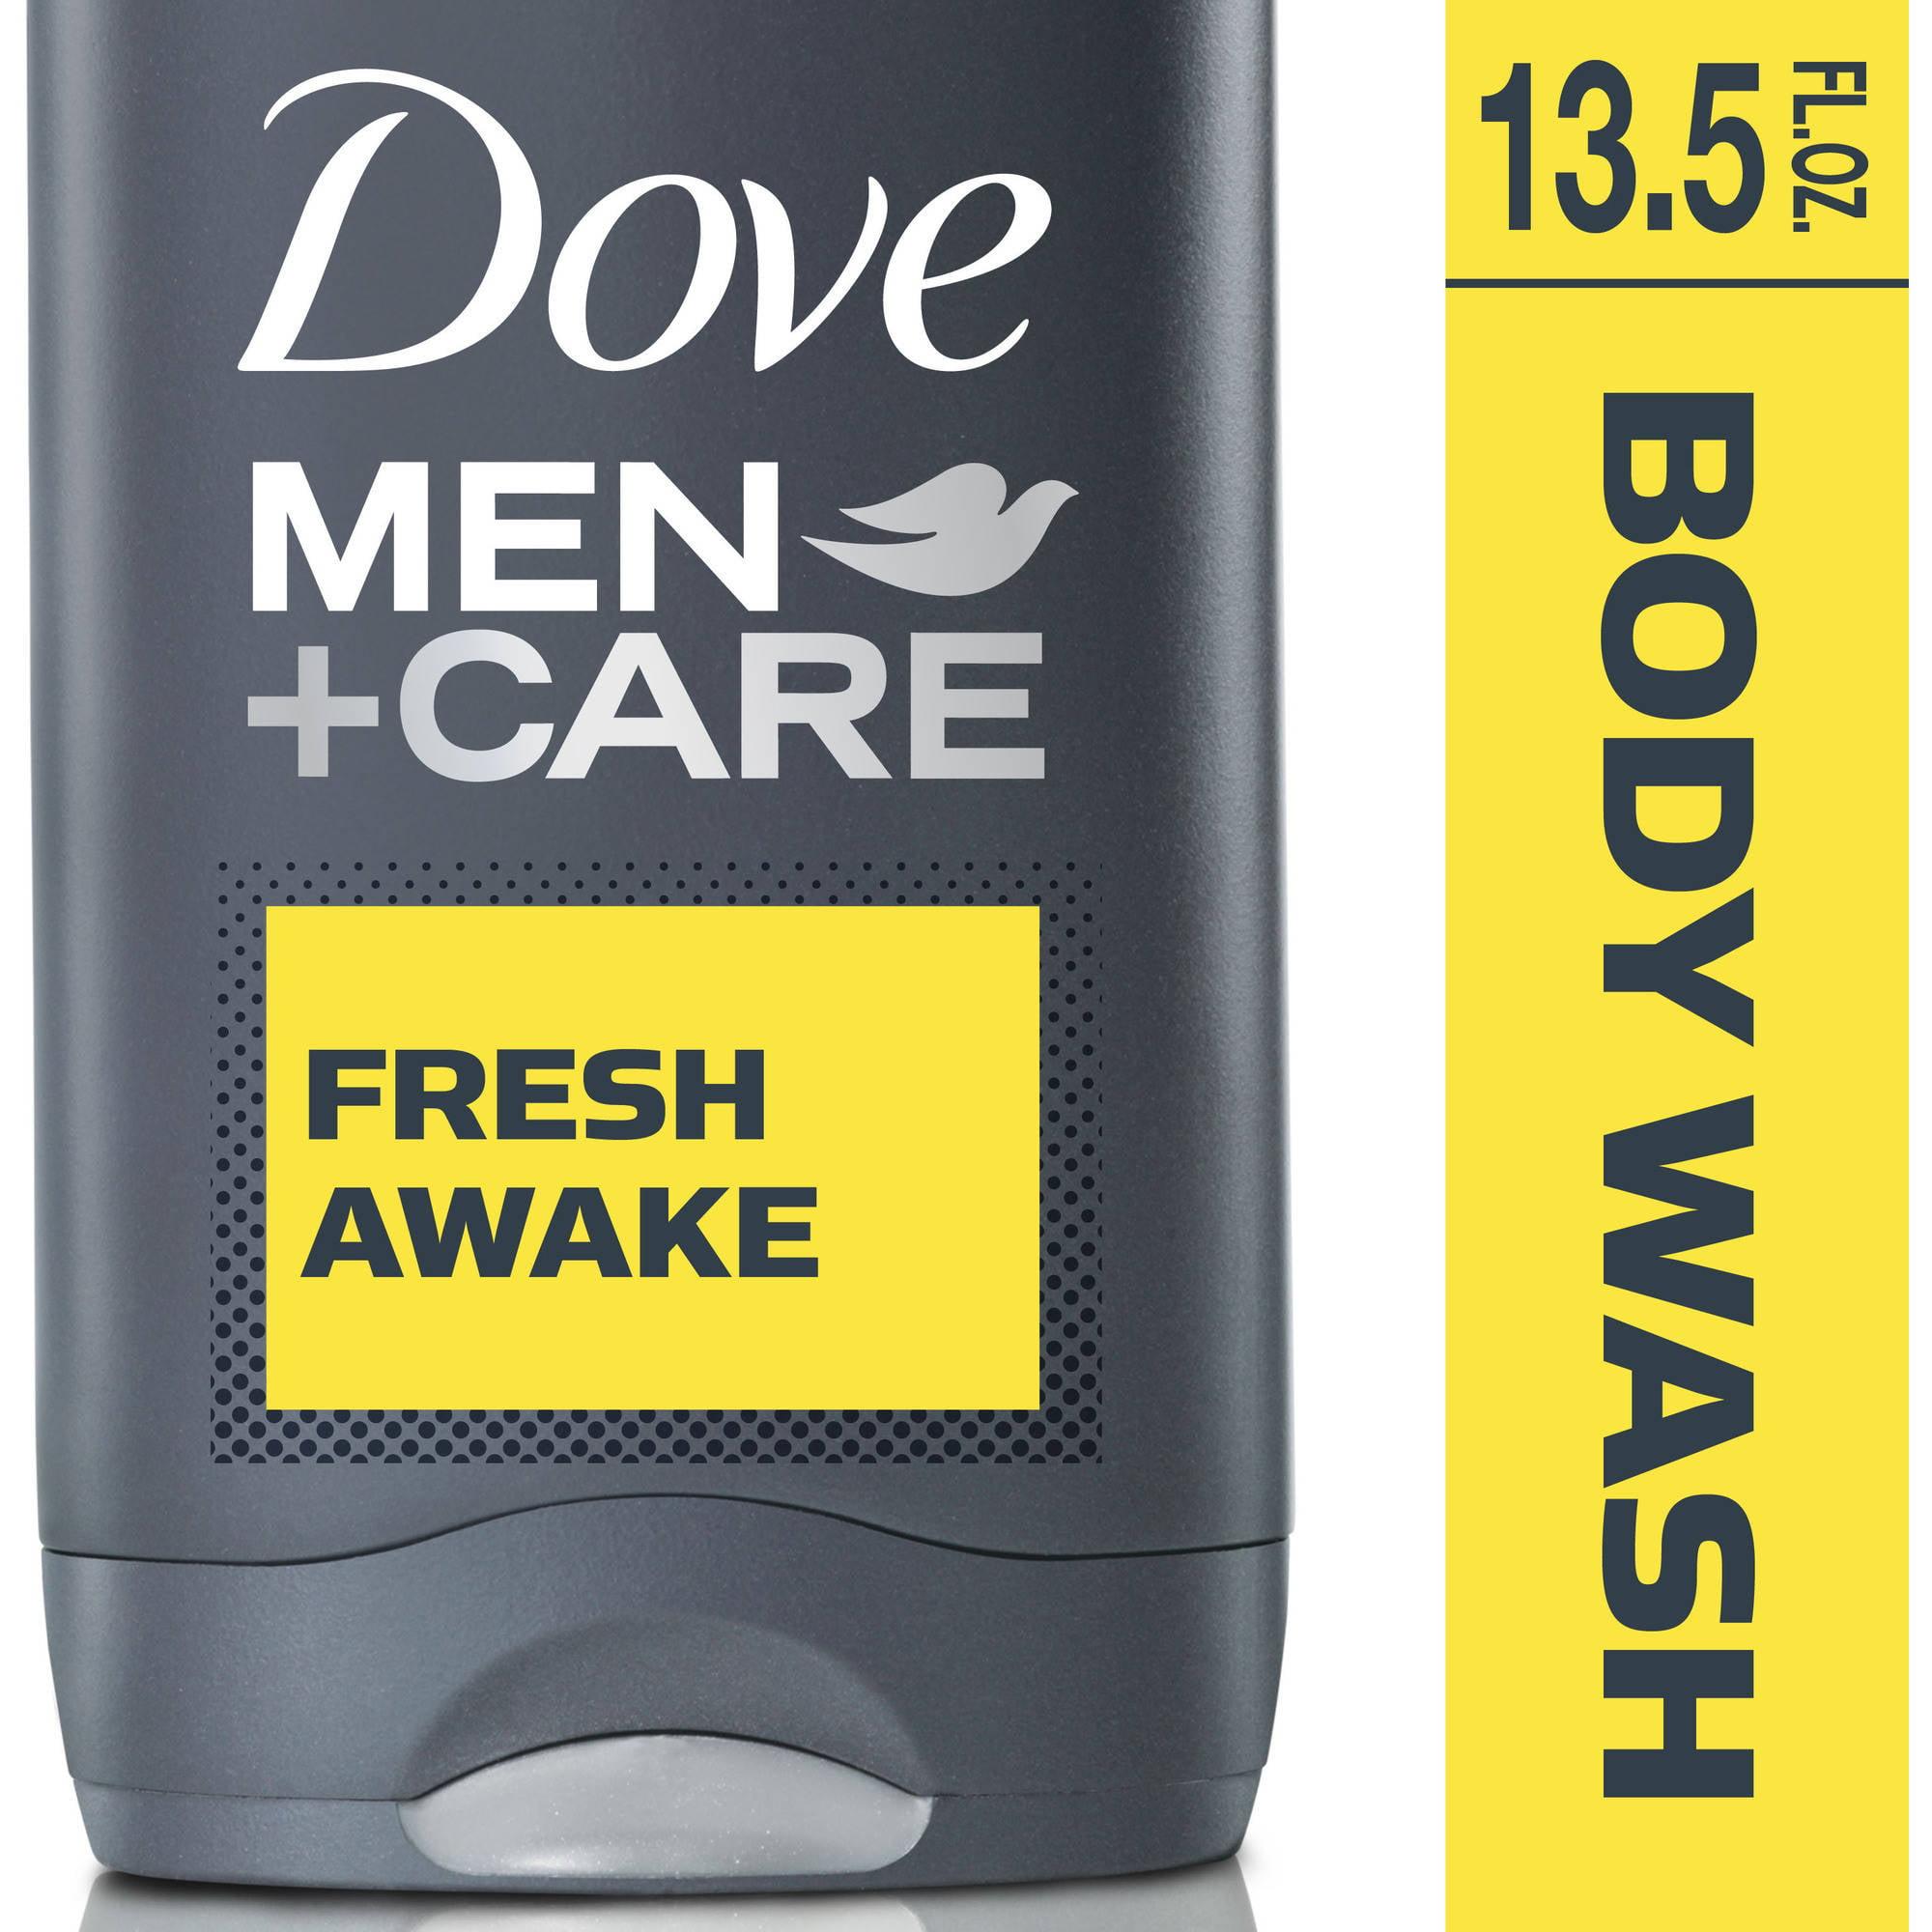 Dove Men Care Fresh Awake Body and Face Wash, 13.5 fl oz